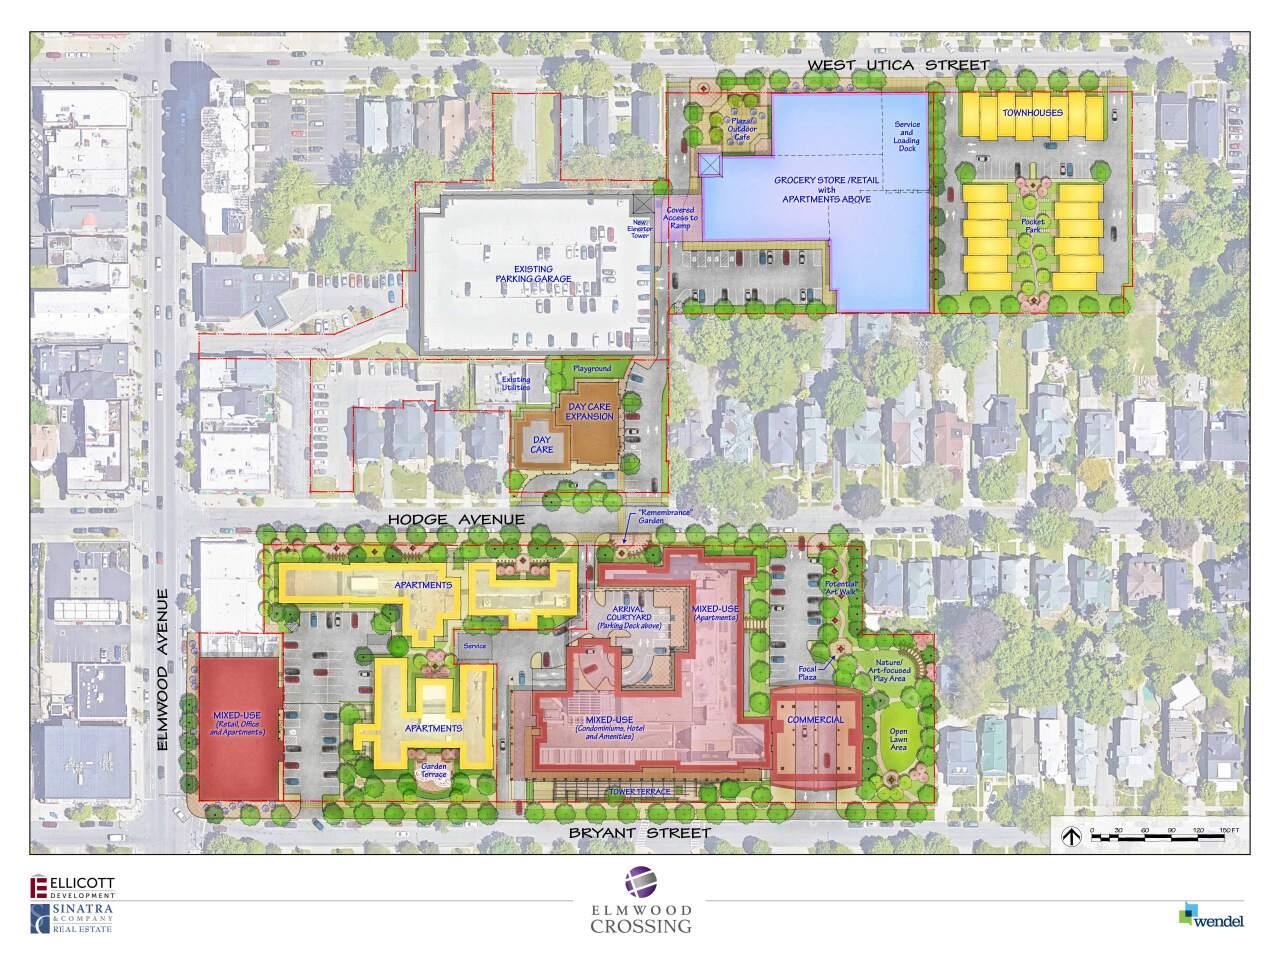 Elmwood Crossing design plans